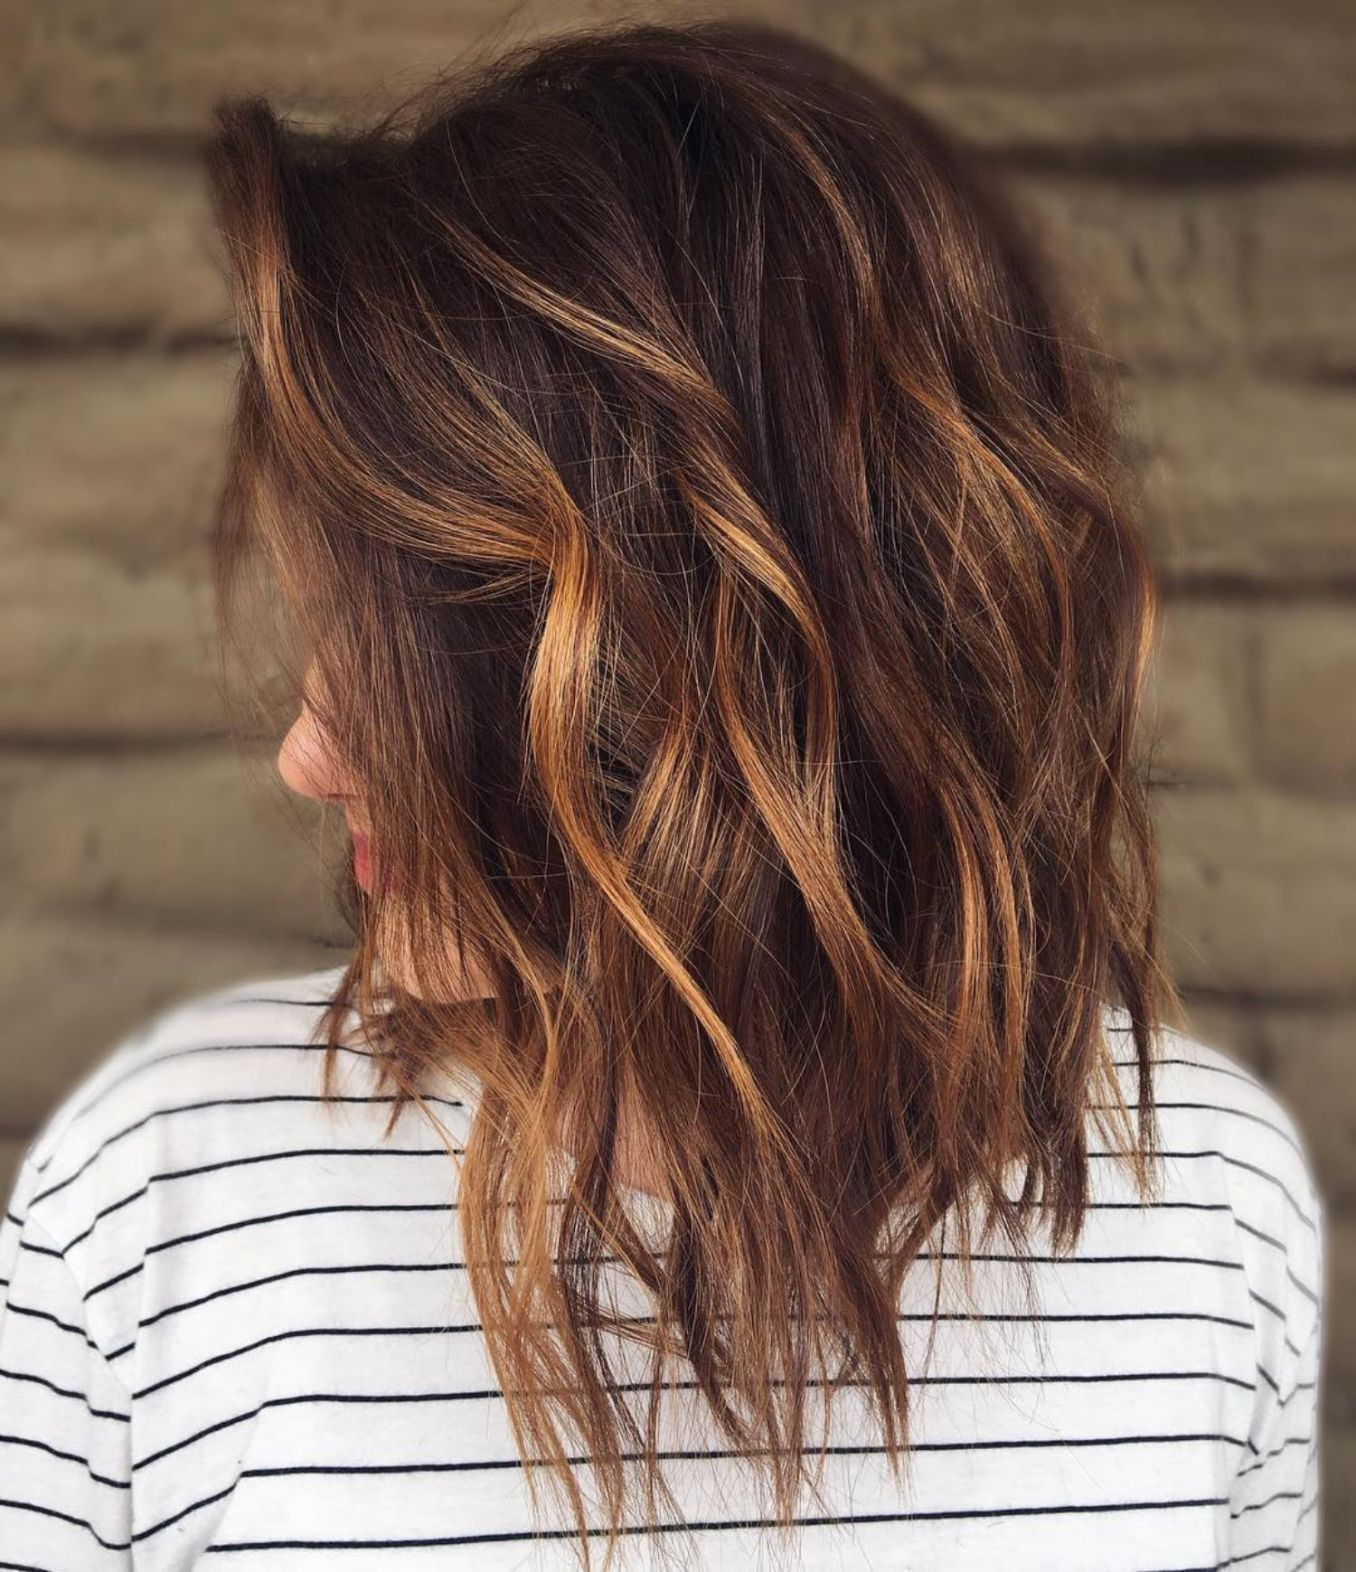 60 Fun and Flattering Medium Hairstyles for Women #caramelbalayage